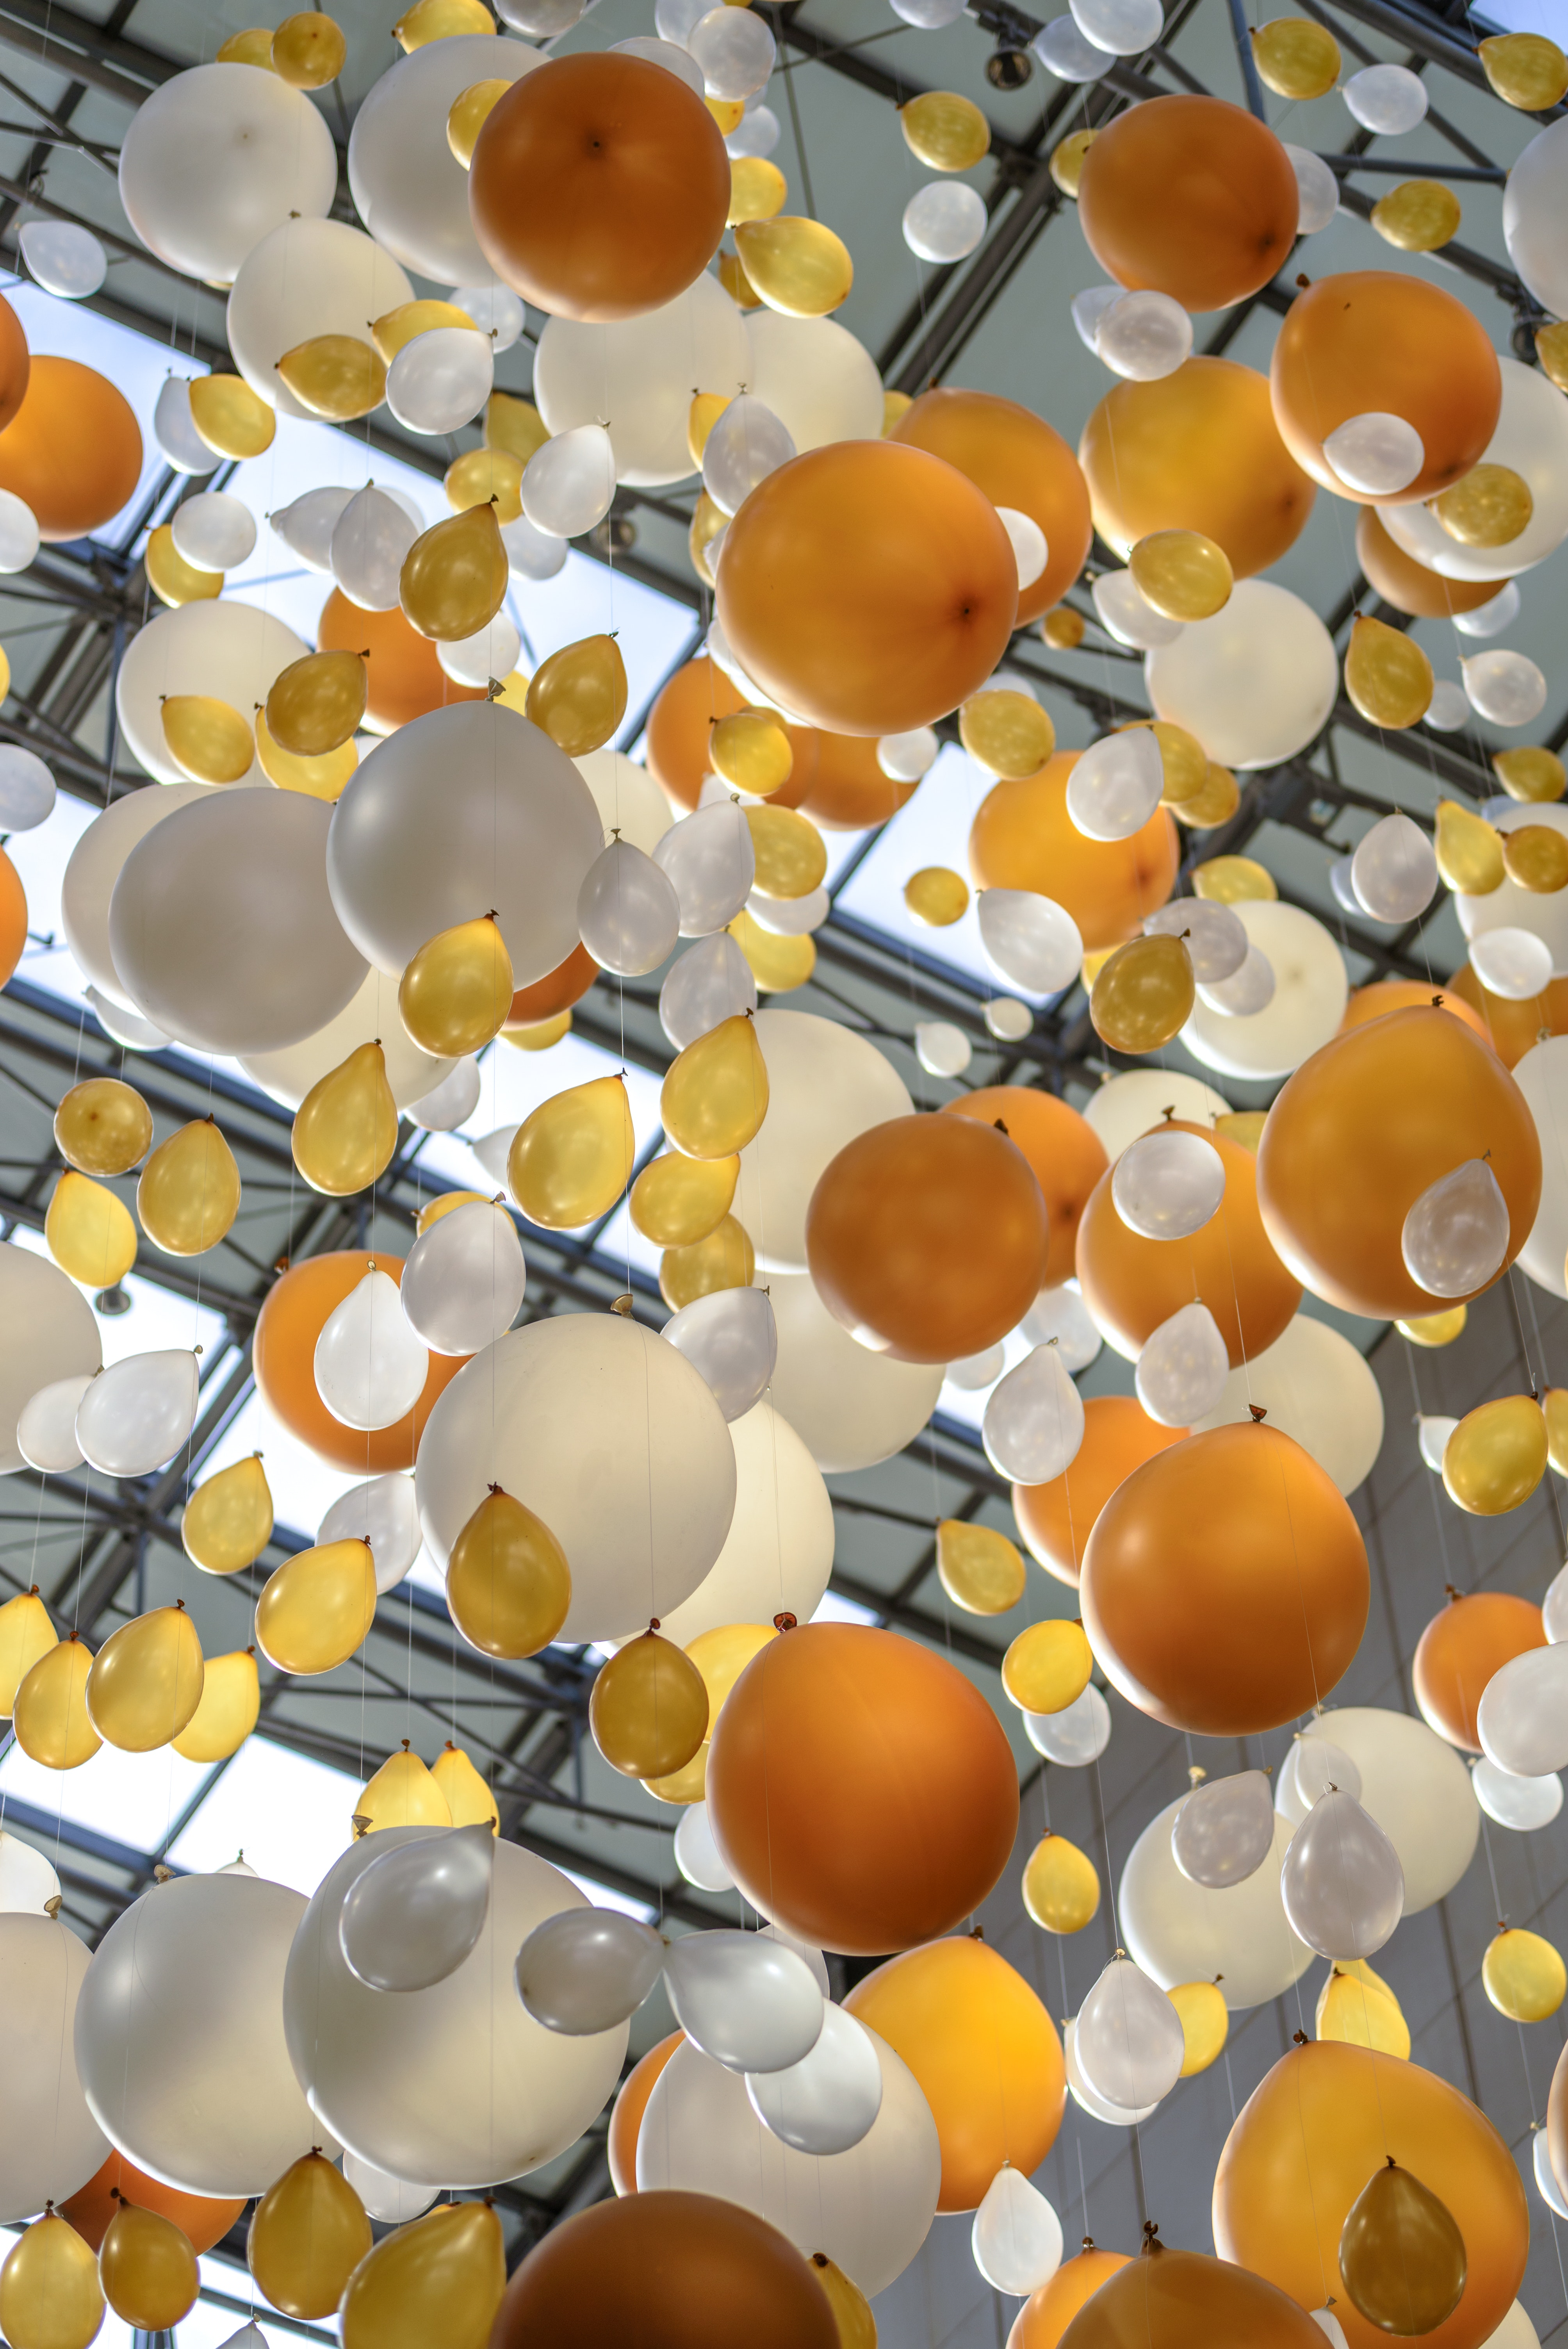 Yellow Balloon Beside White Balloon, Art, Balloons, Birthday, Bright, HQ Photo